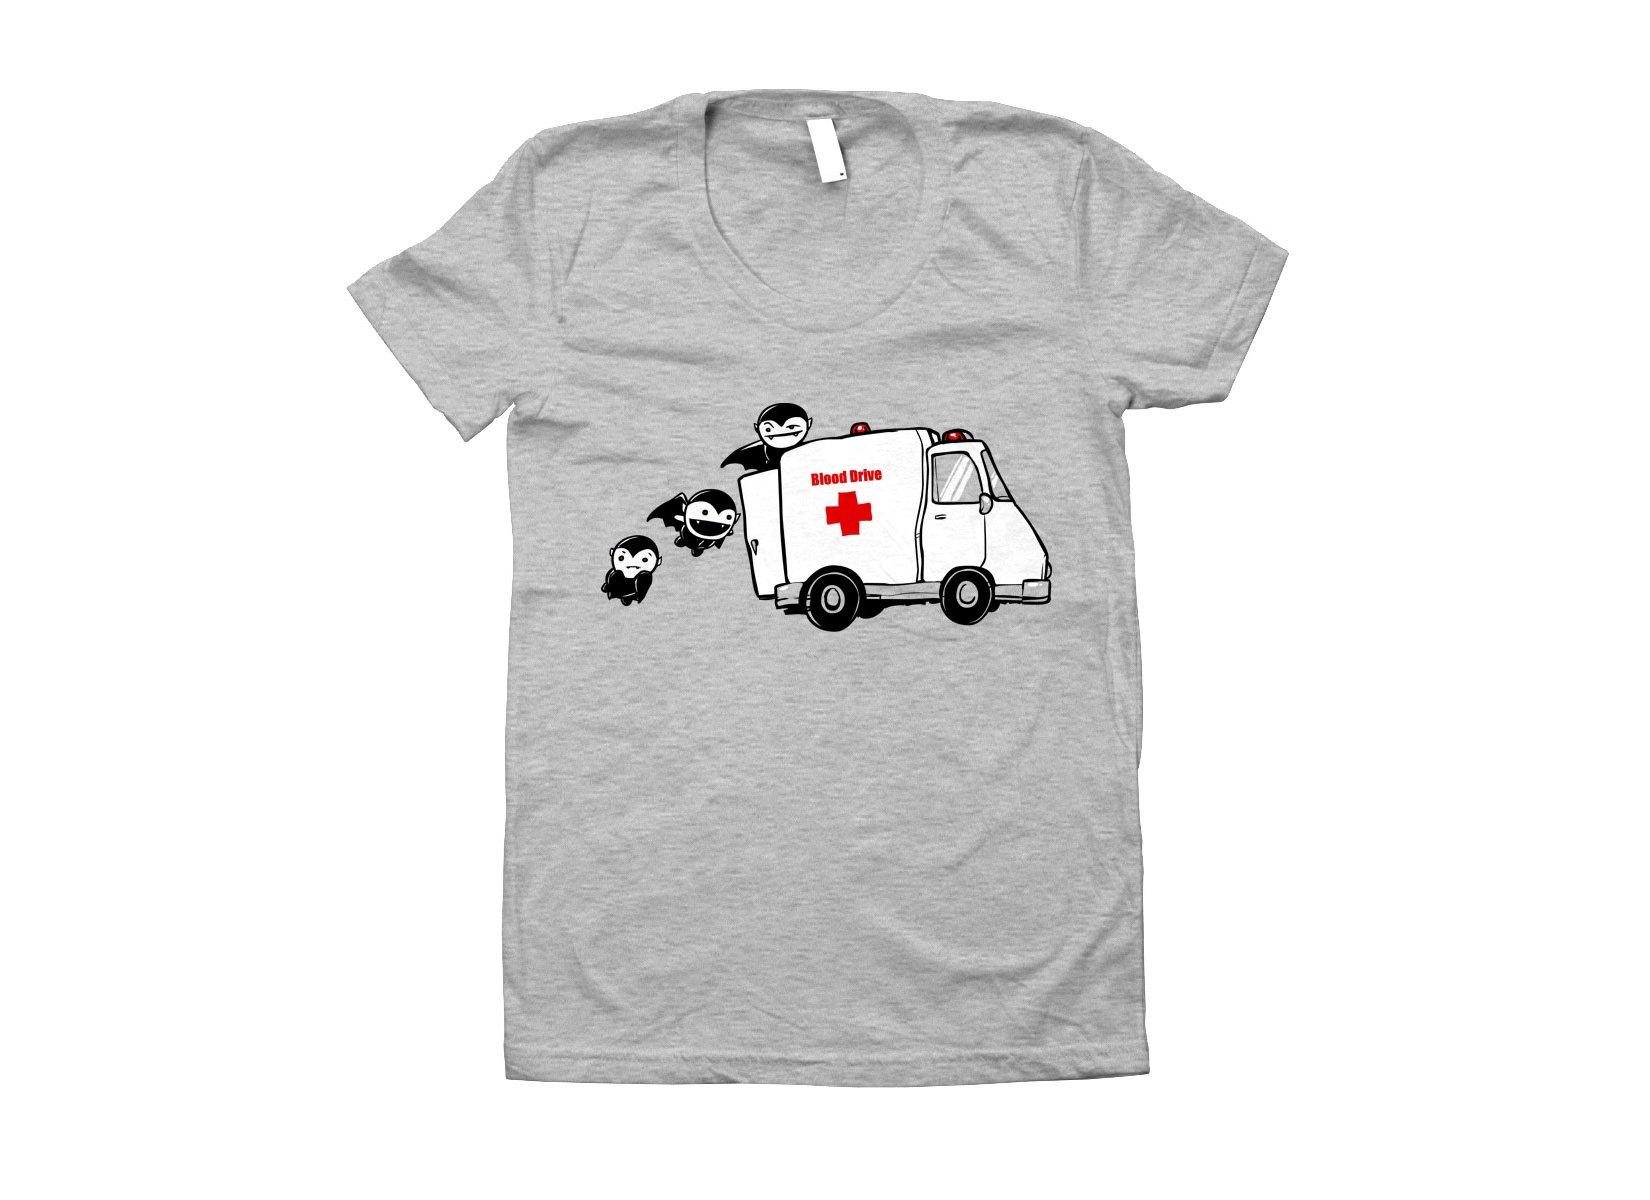 Blood Drive Vampires on Juniors T-Shirt